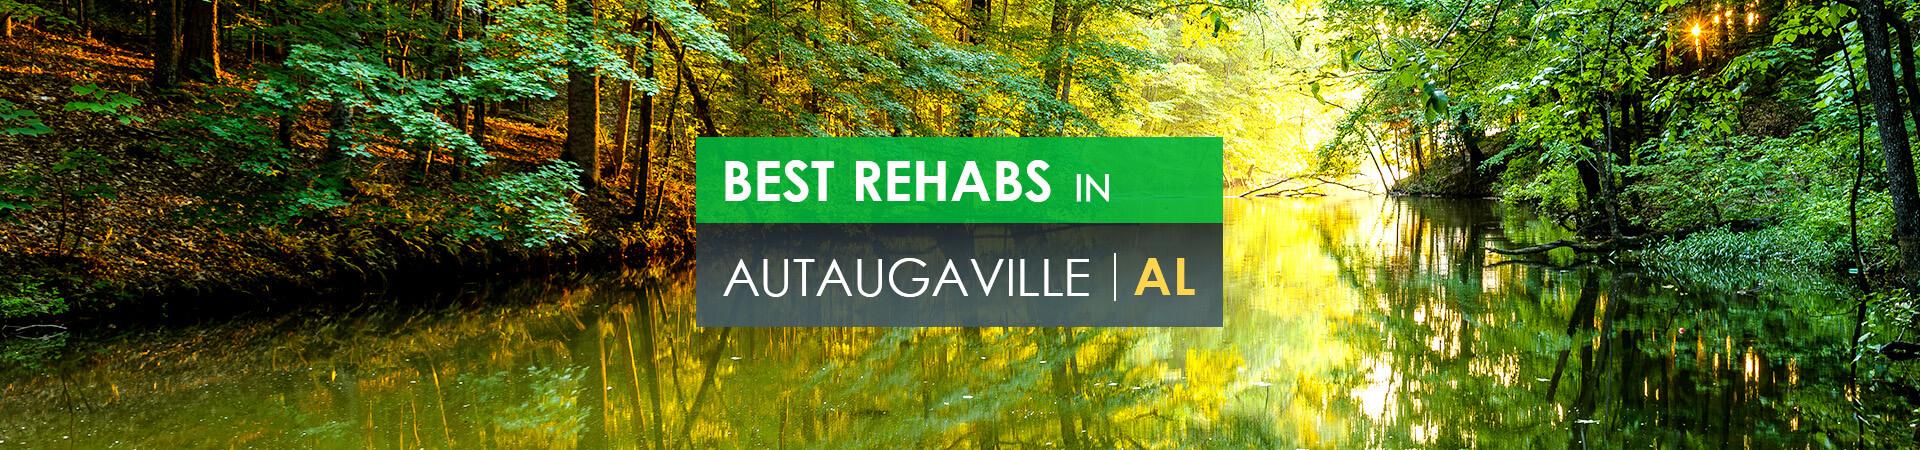 Best rehabs in Autaugaville, AL